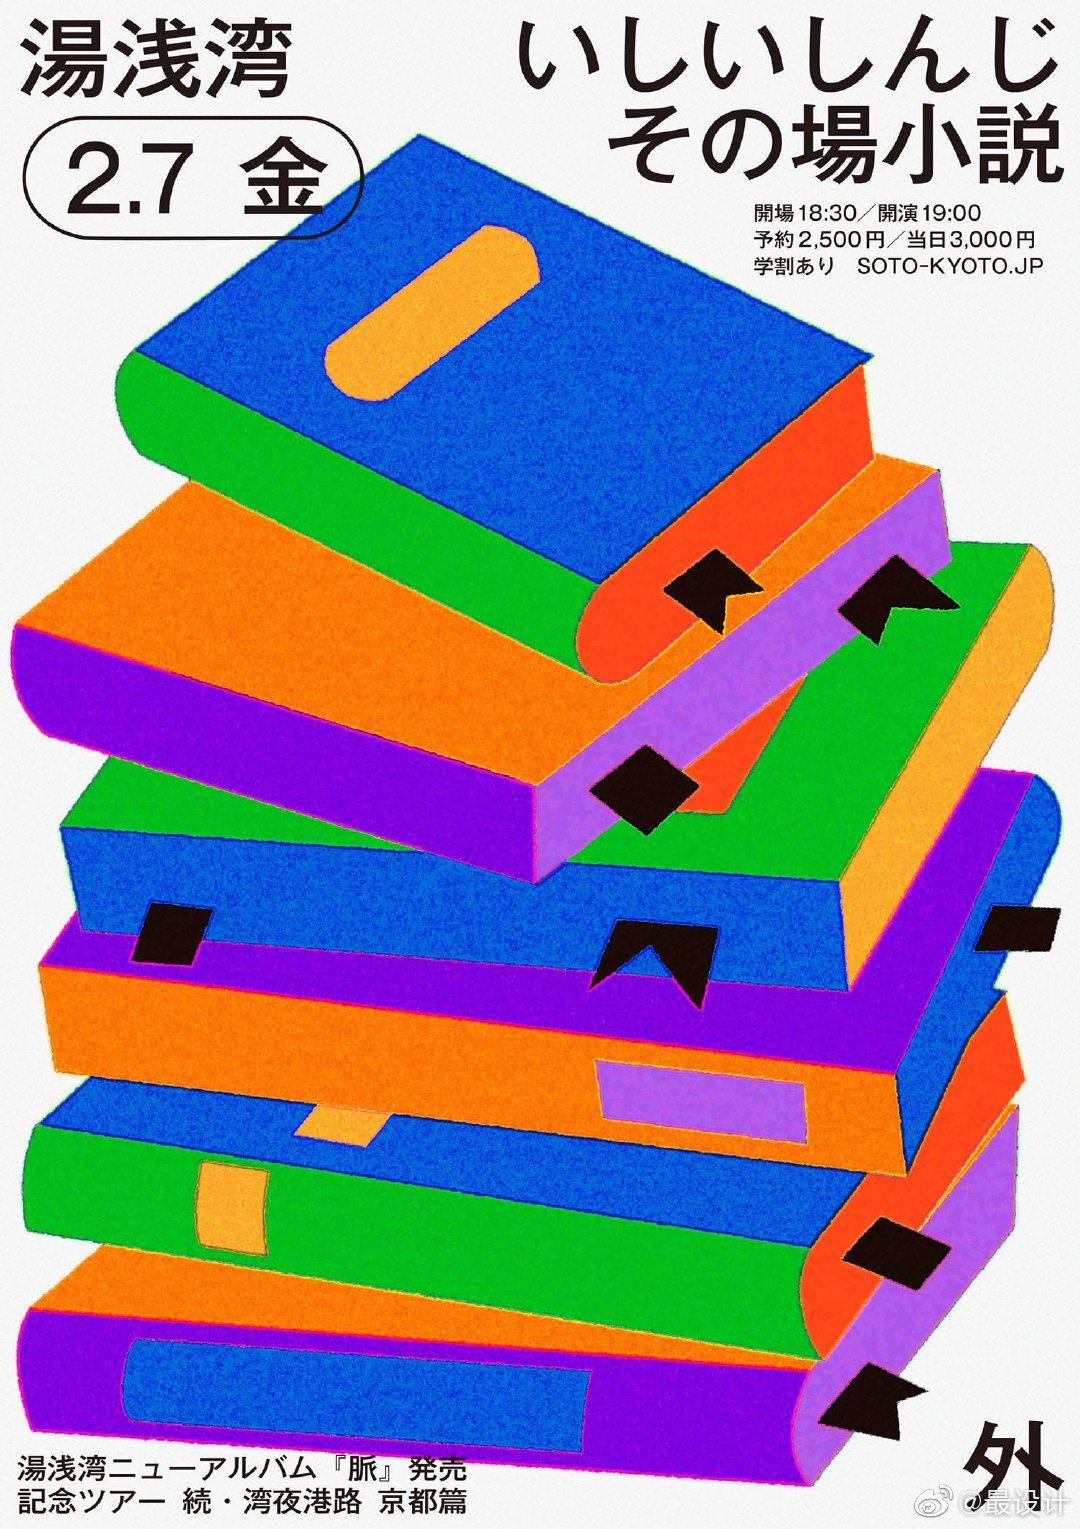 Pin by Elizabeth Howard on Illustration in 2020 Poster